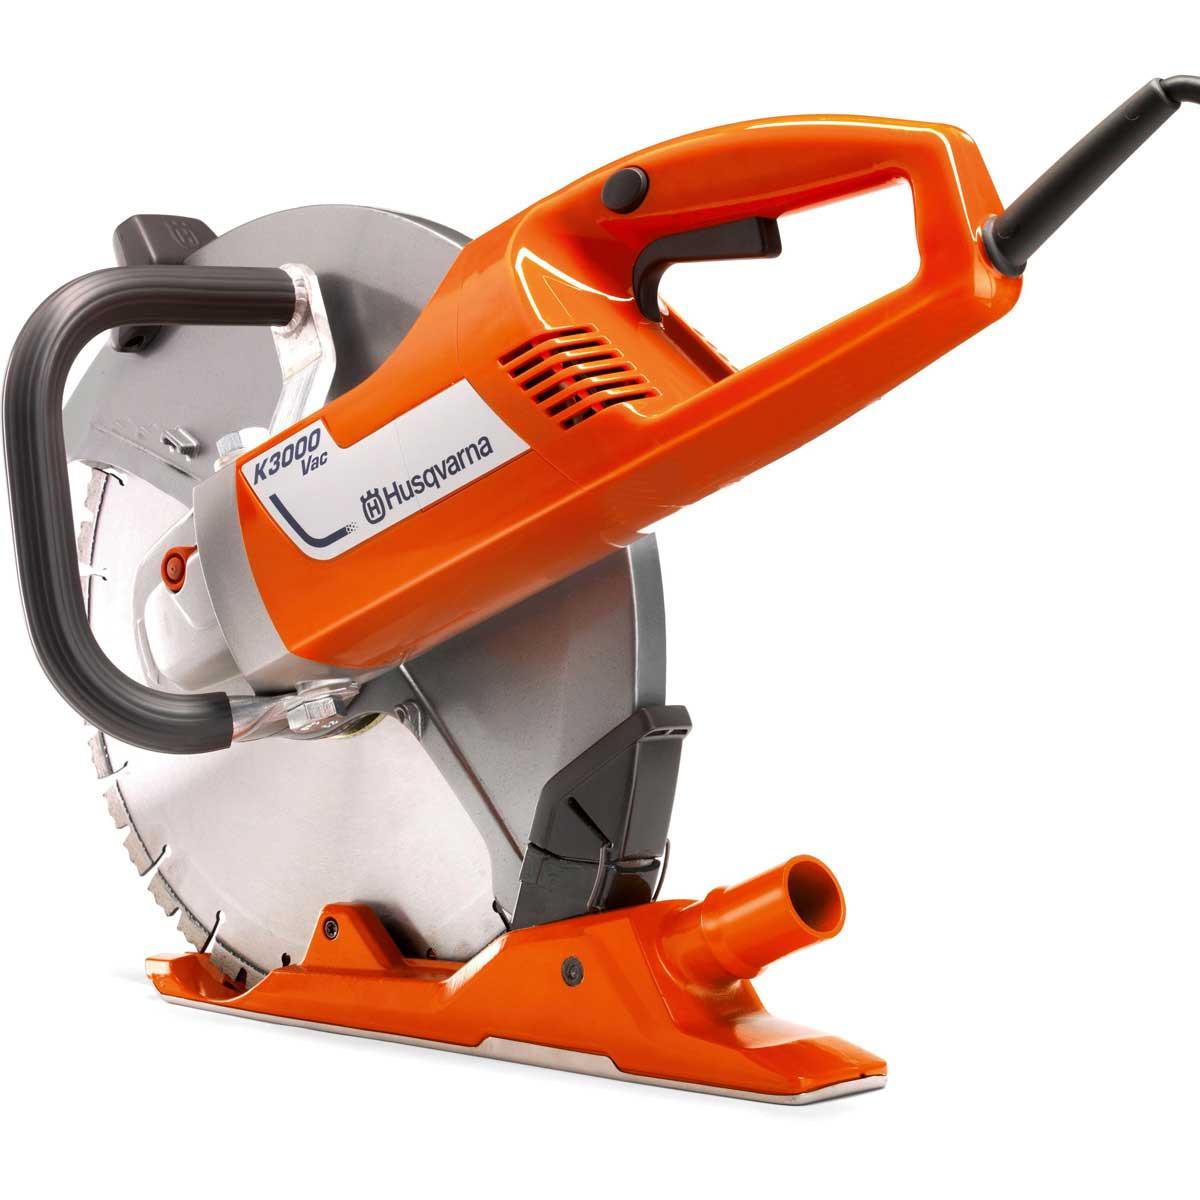 Husqvarna K3000 Vac vacuum shoe